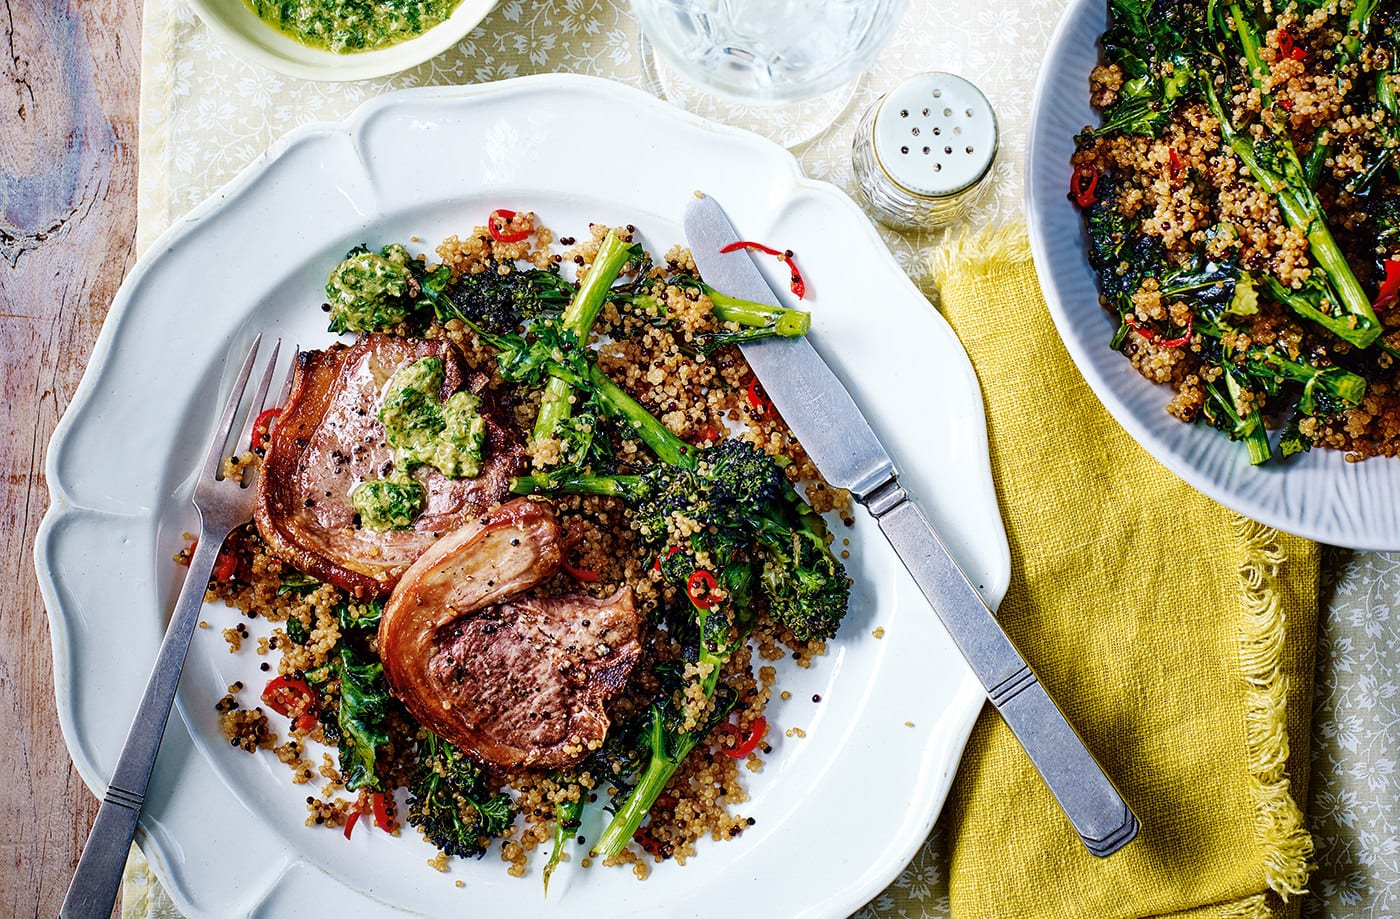 Lamb chops with broccoli LGH mini e914b883 0d42 482f bd93 7b4d54848e6d 0 1400x919